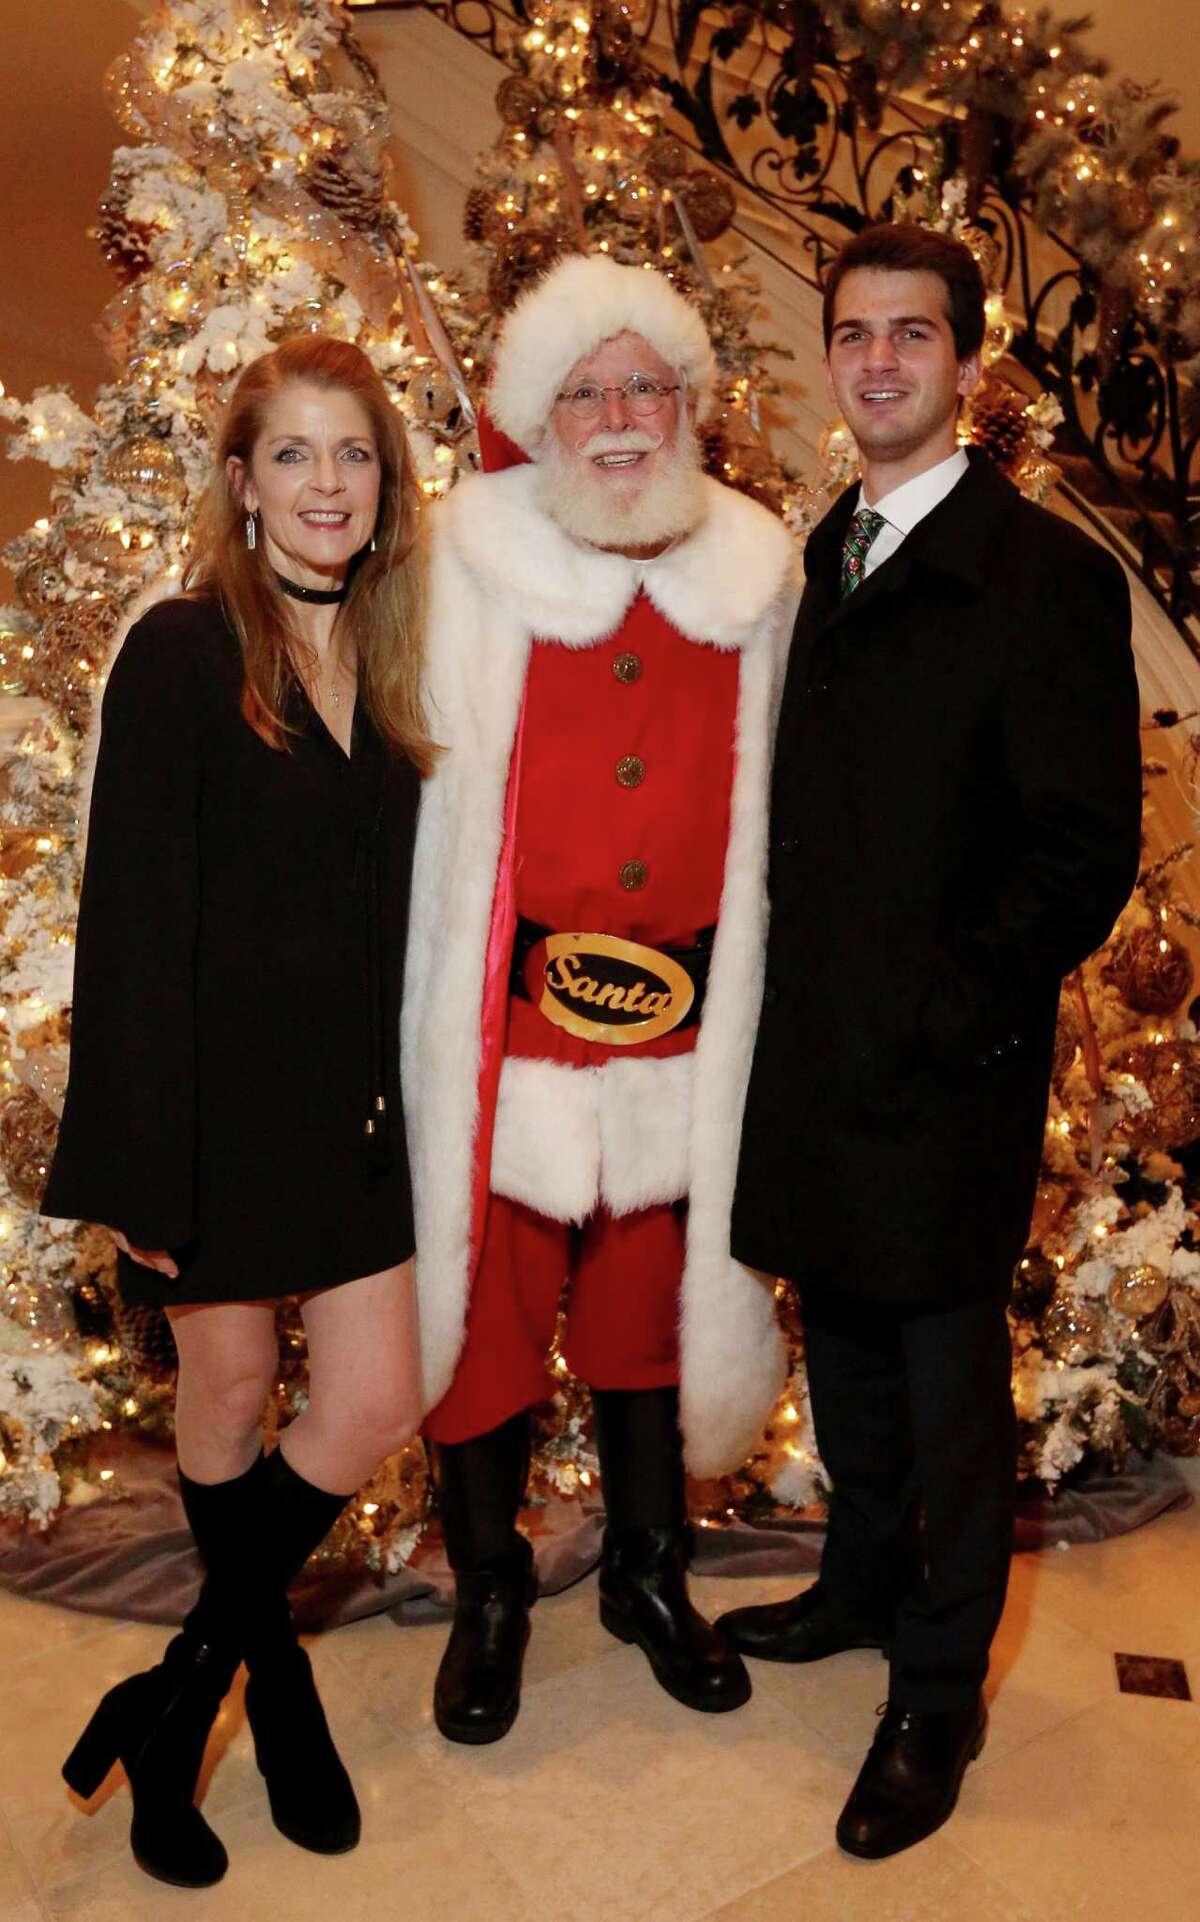 Fertitta, Santa and her son, Michael Fertitta